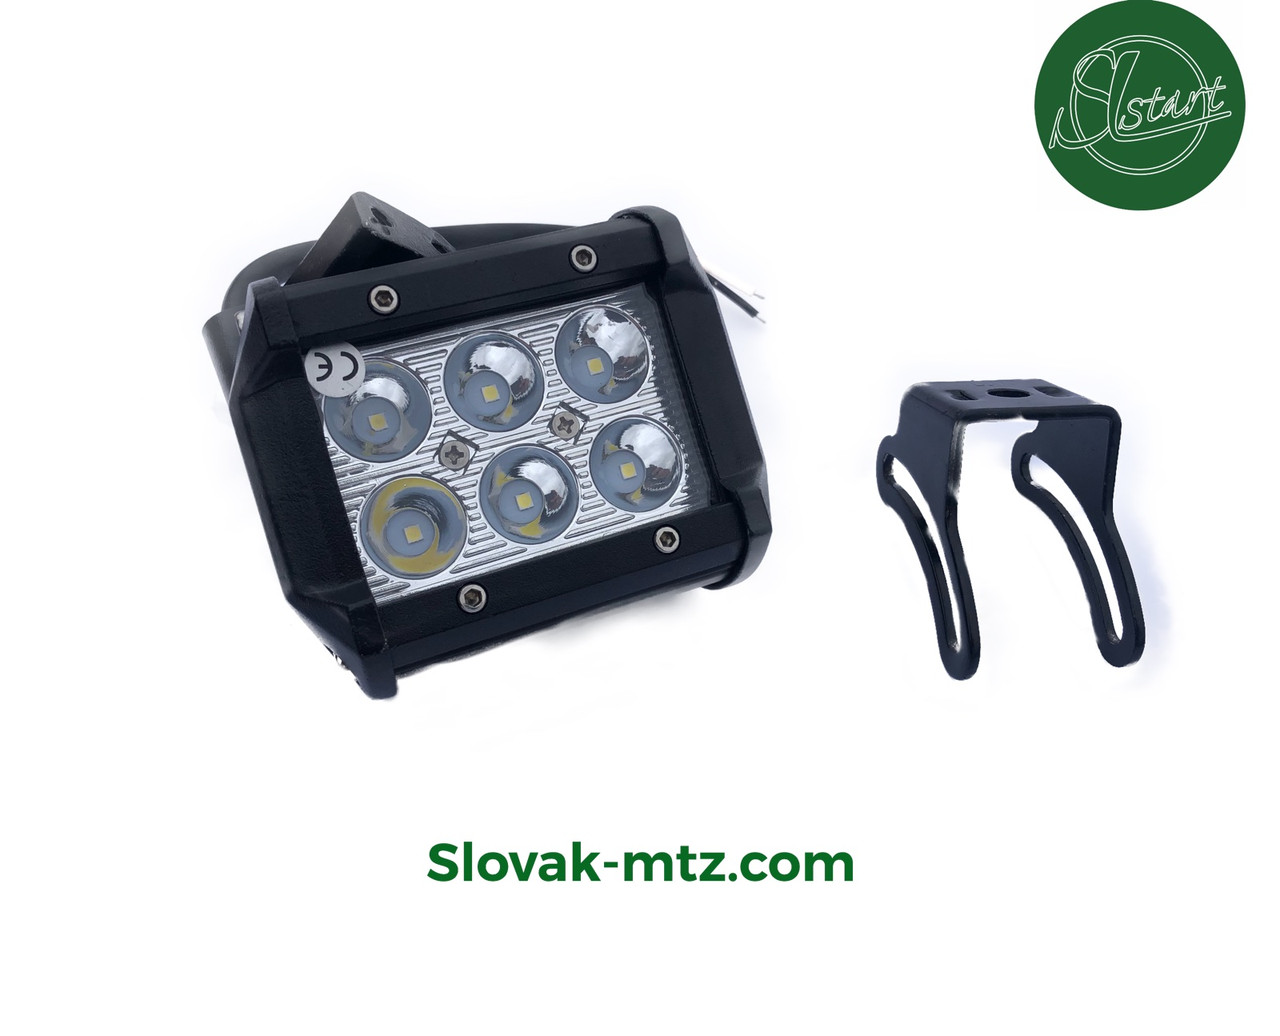 Светодиодная LED фара 18Вт  (светодиоды 3w x6шт)